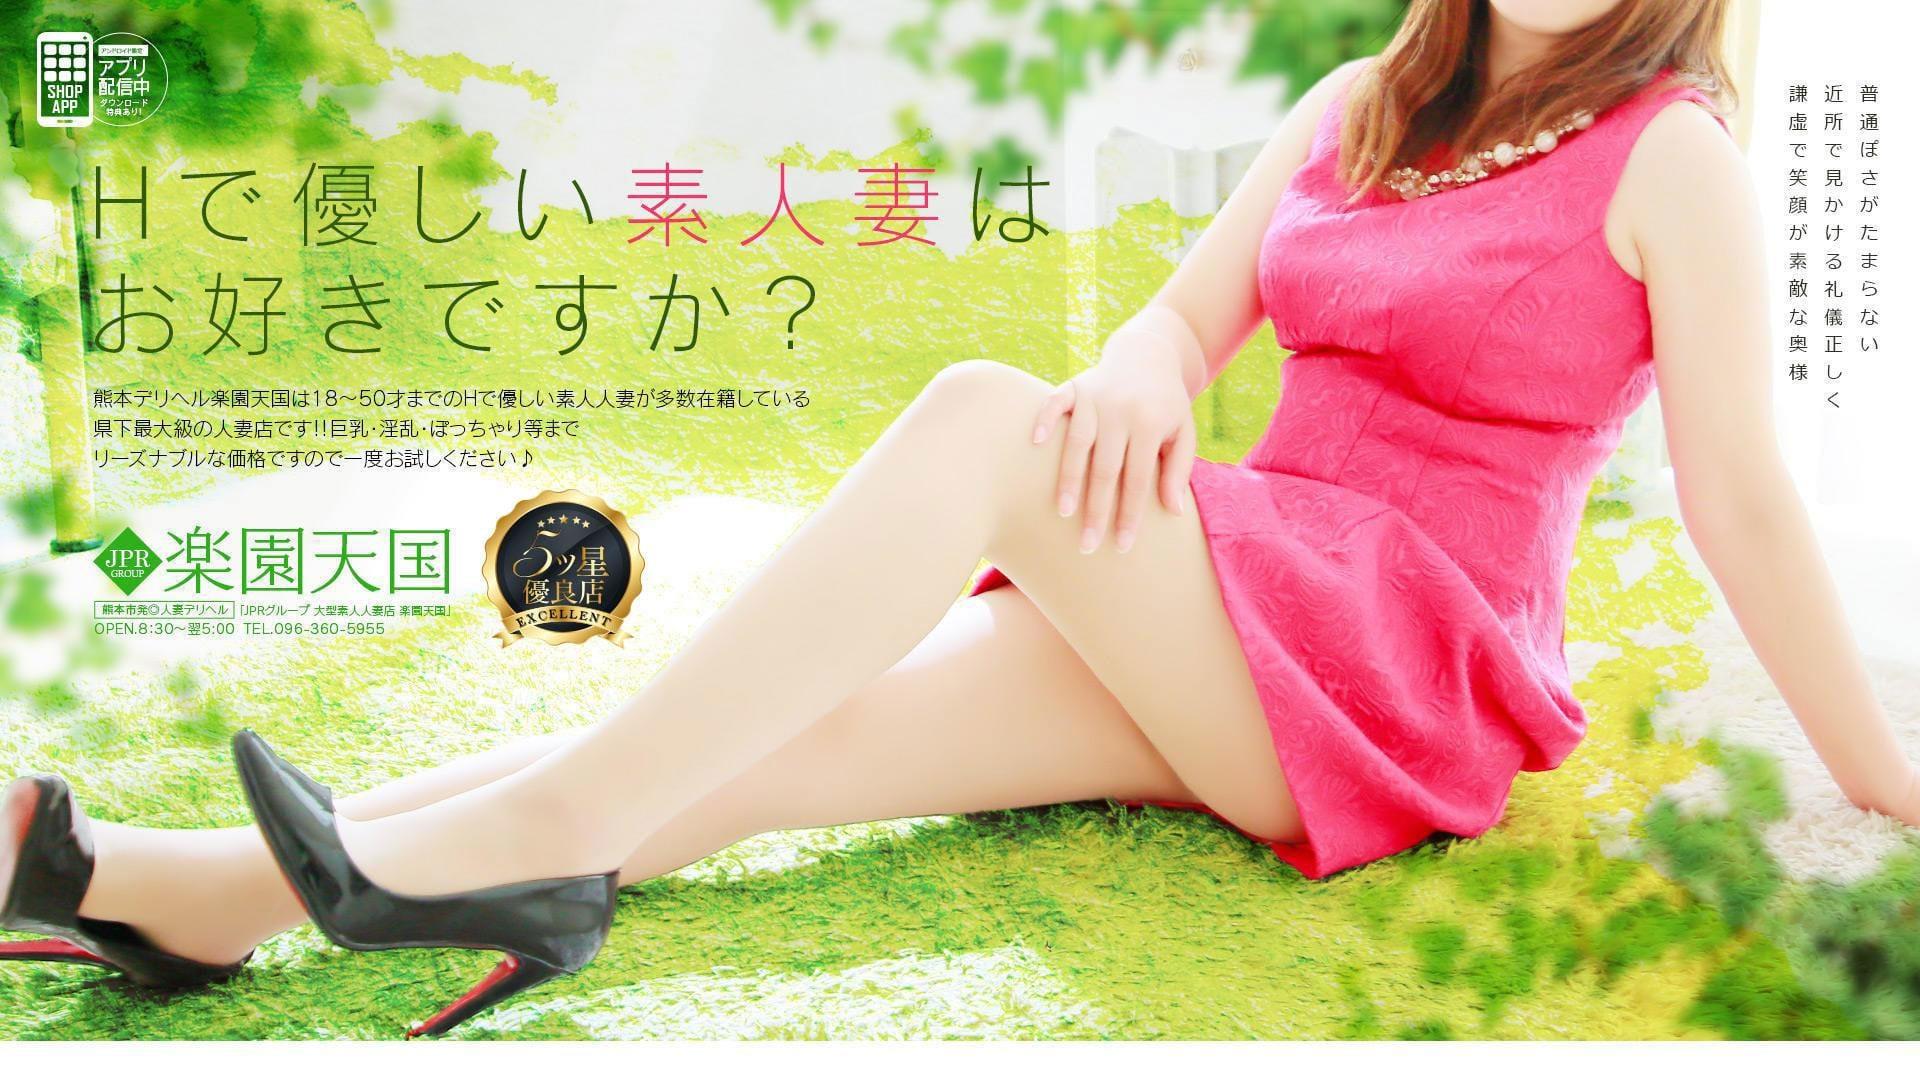 JPRグループ 人妻専門店 楽園天国